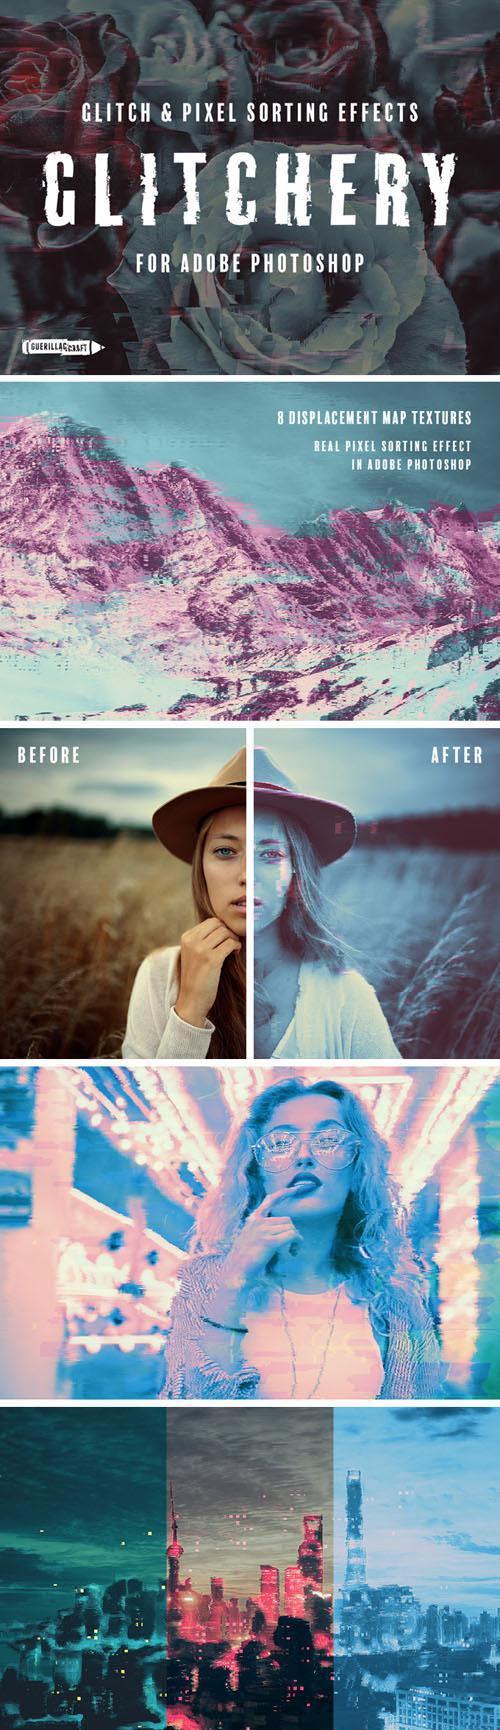 Glitchery - Glitch & Pixel Sorting Effects for Adobe Photoshop